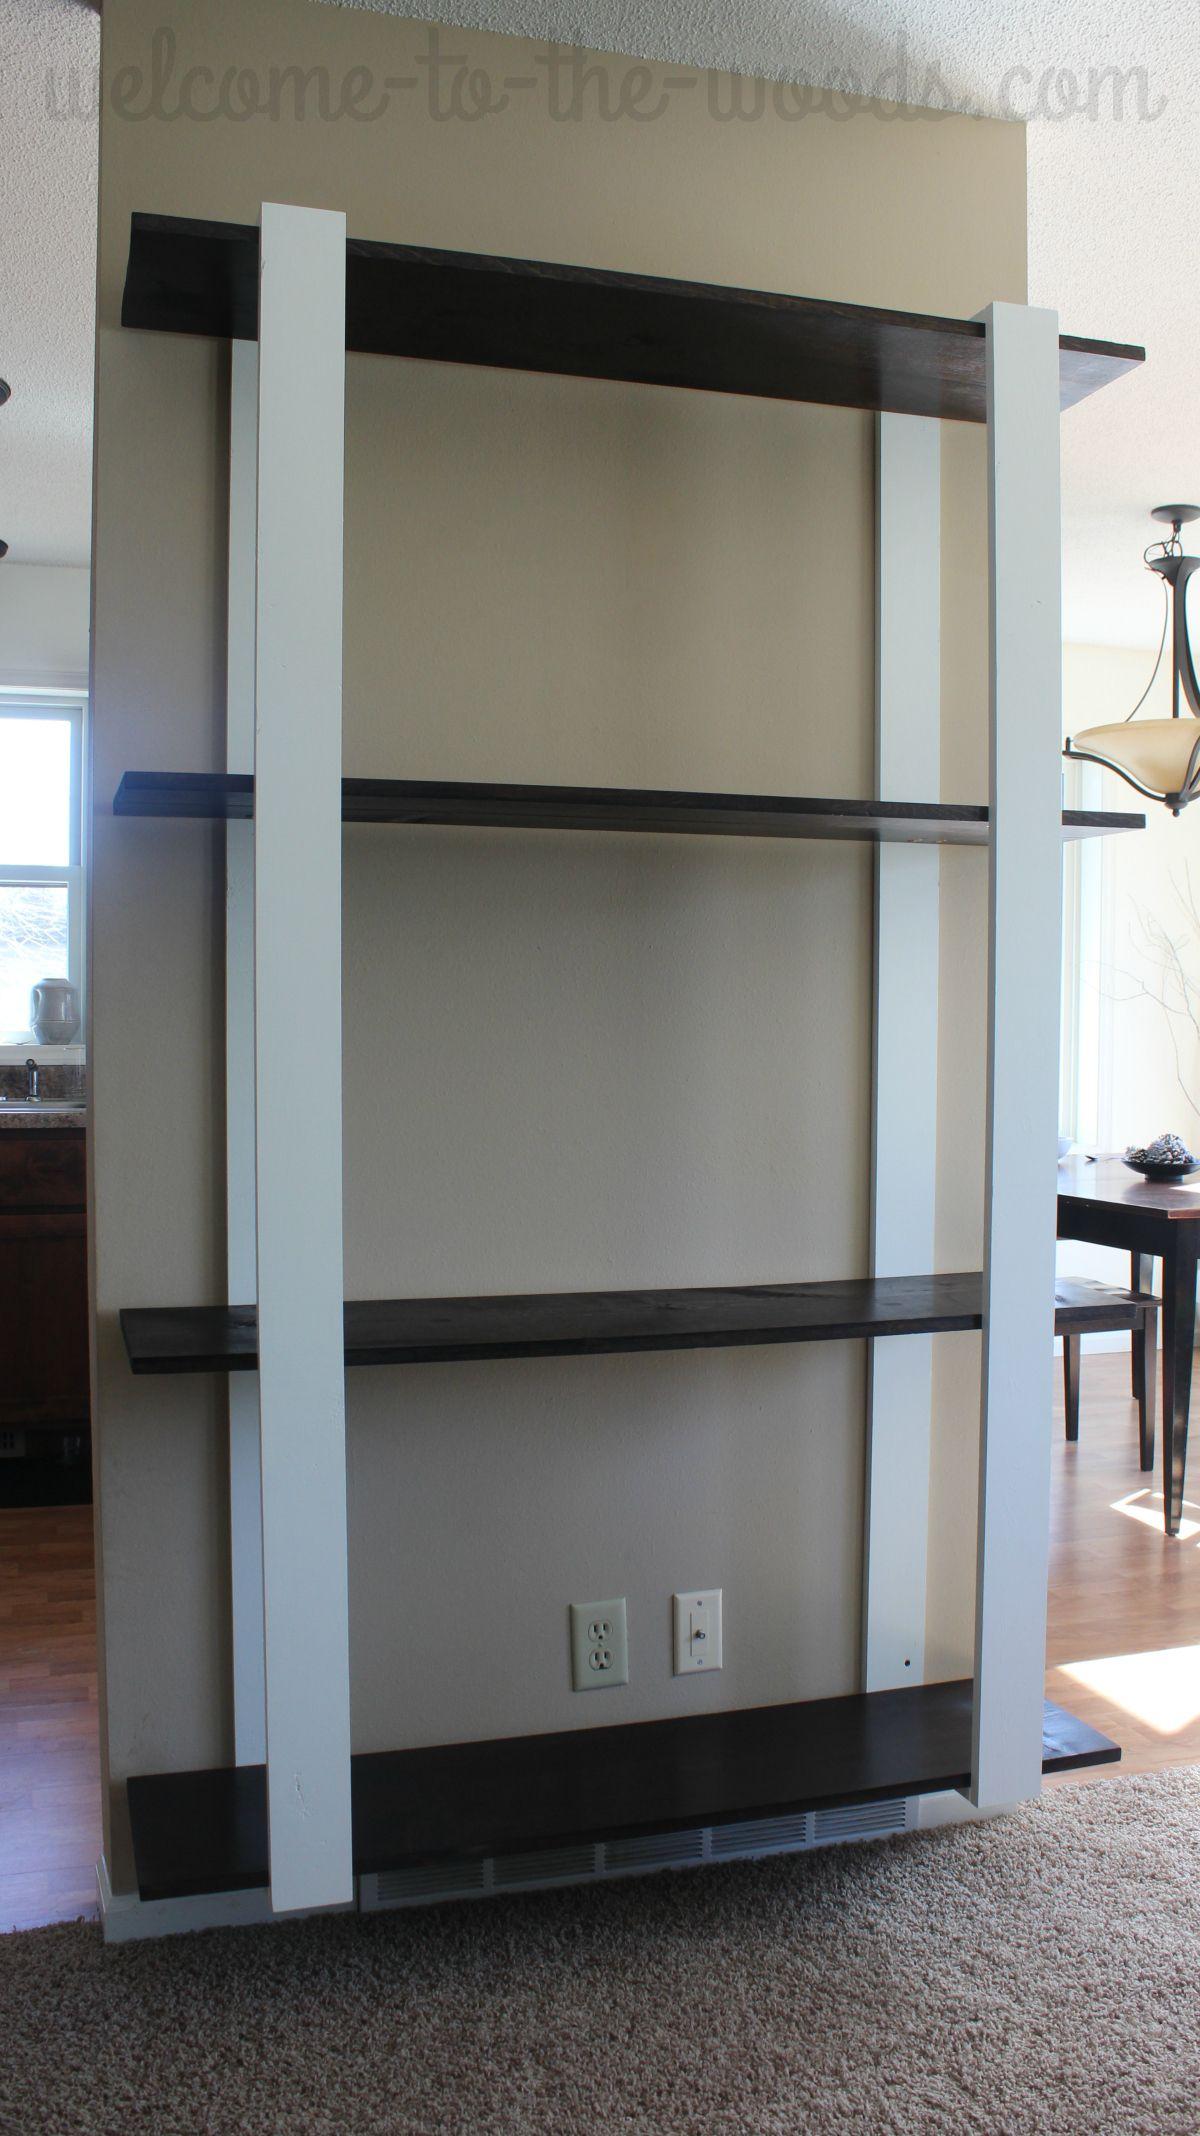 Modern DIY Shelves For Just $25 | Top Blogs - Pinterest Viral Board ...